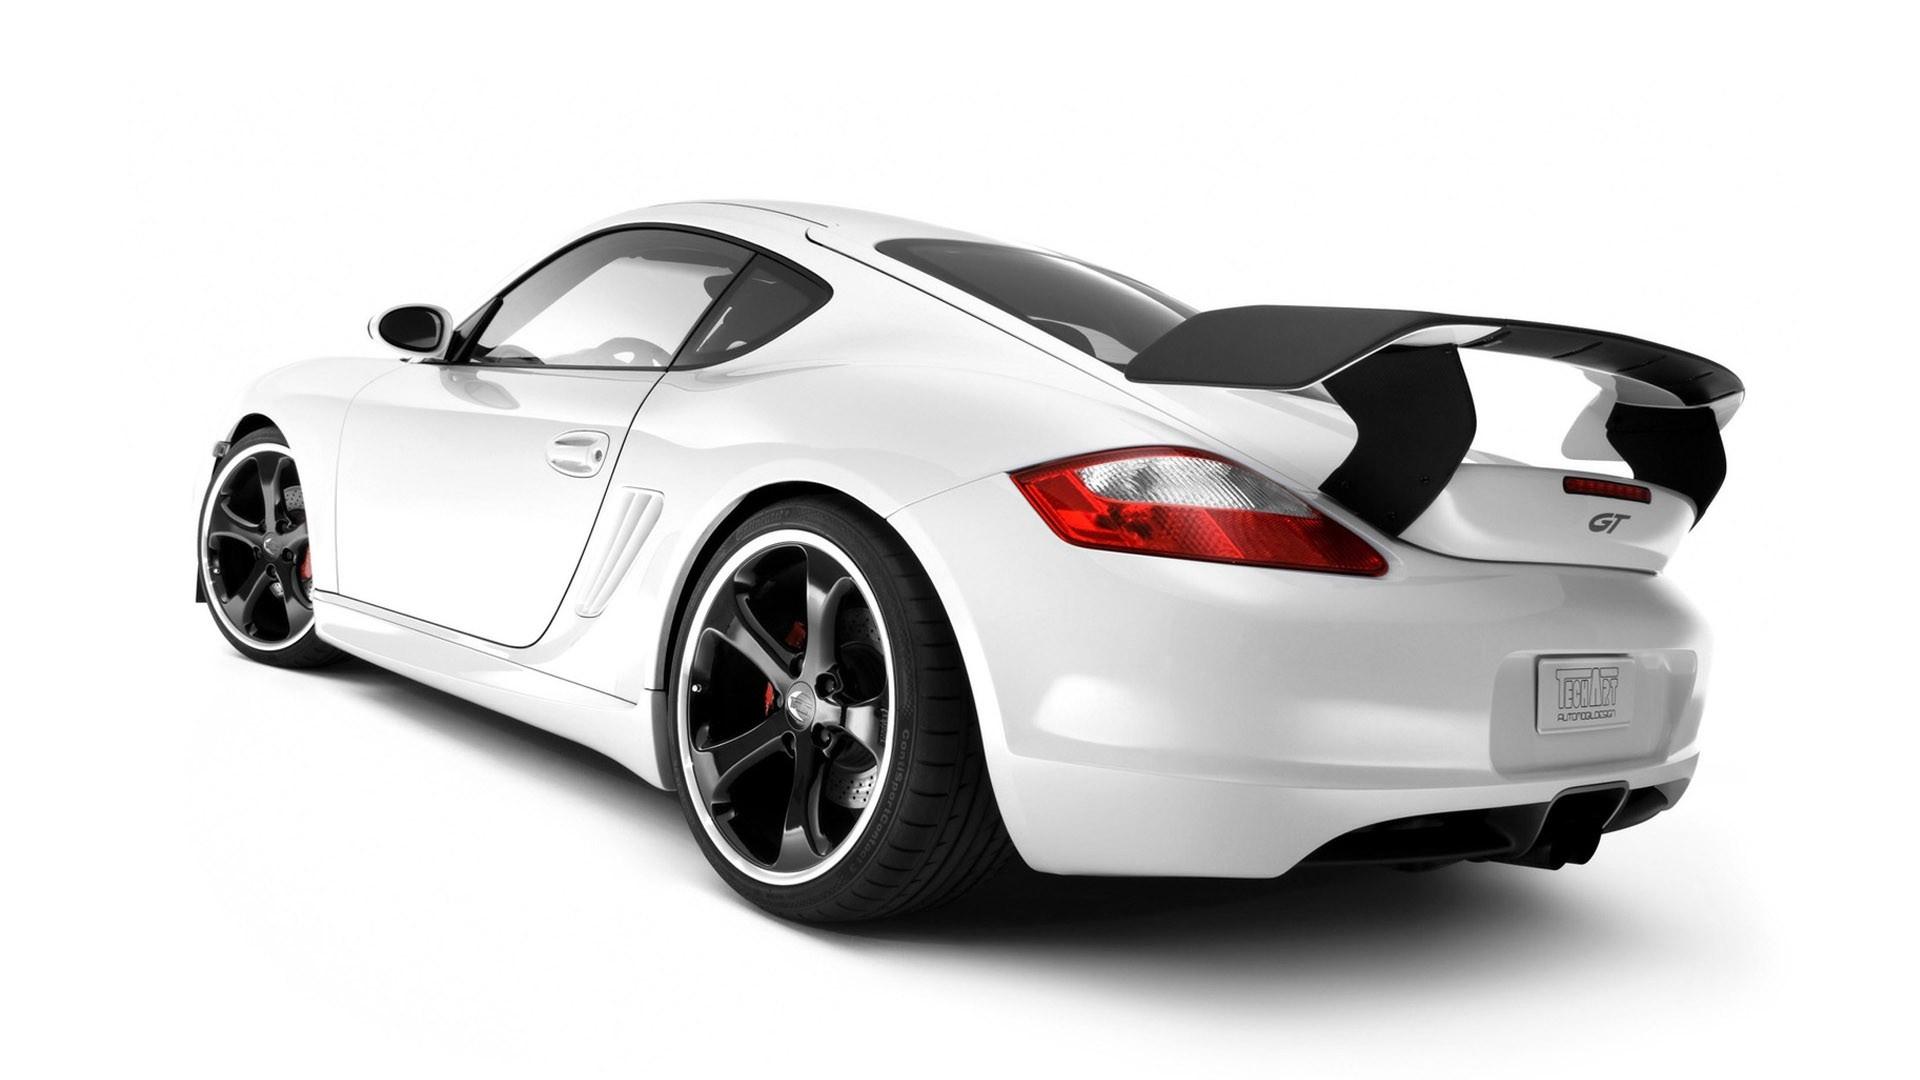 Download Wallpaper 1920x1080 Porsche White Auto Black Rear View